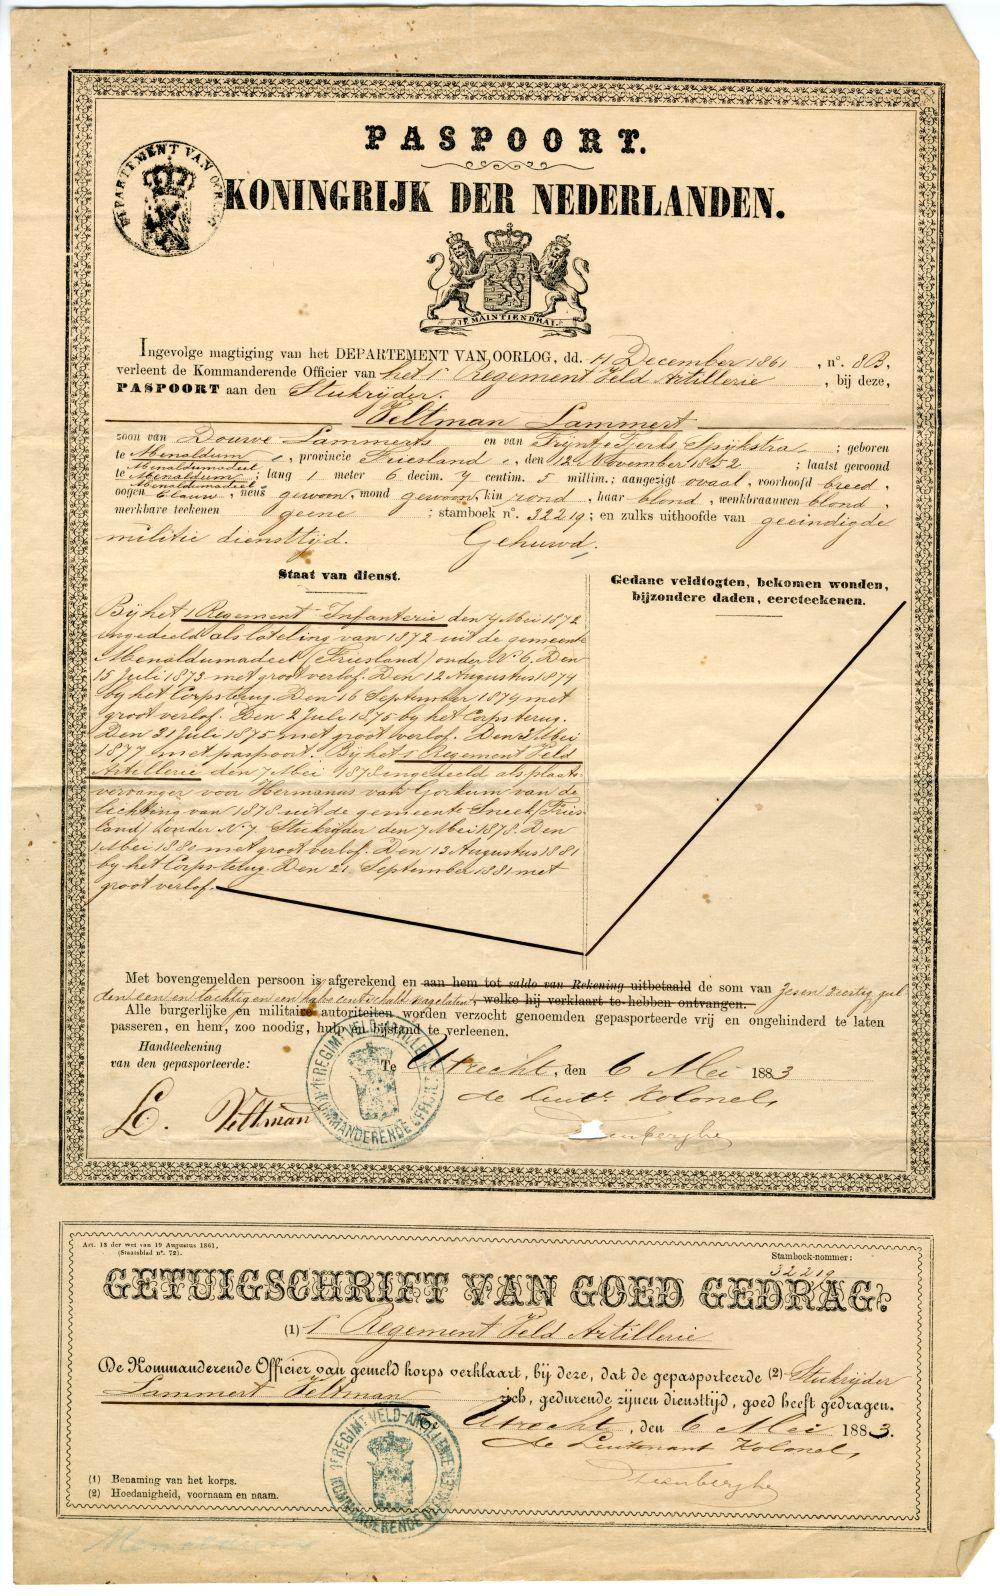 Militair paspoort uit 1883